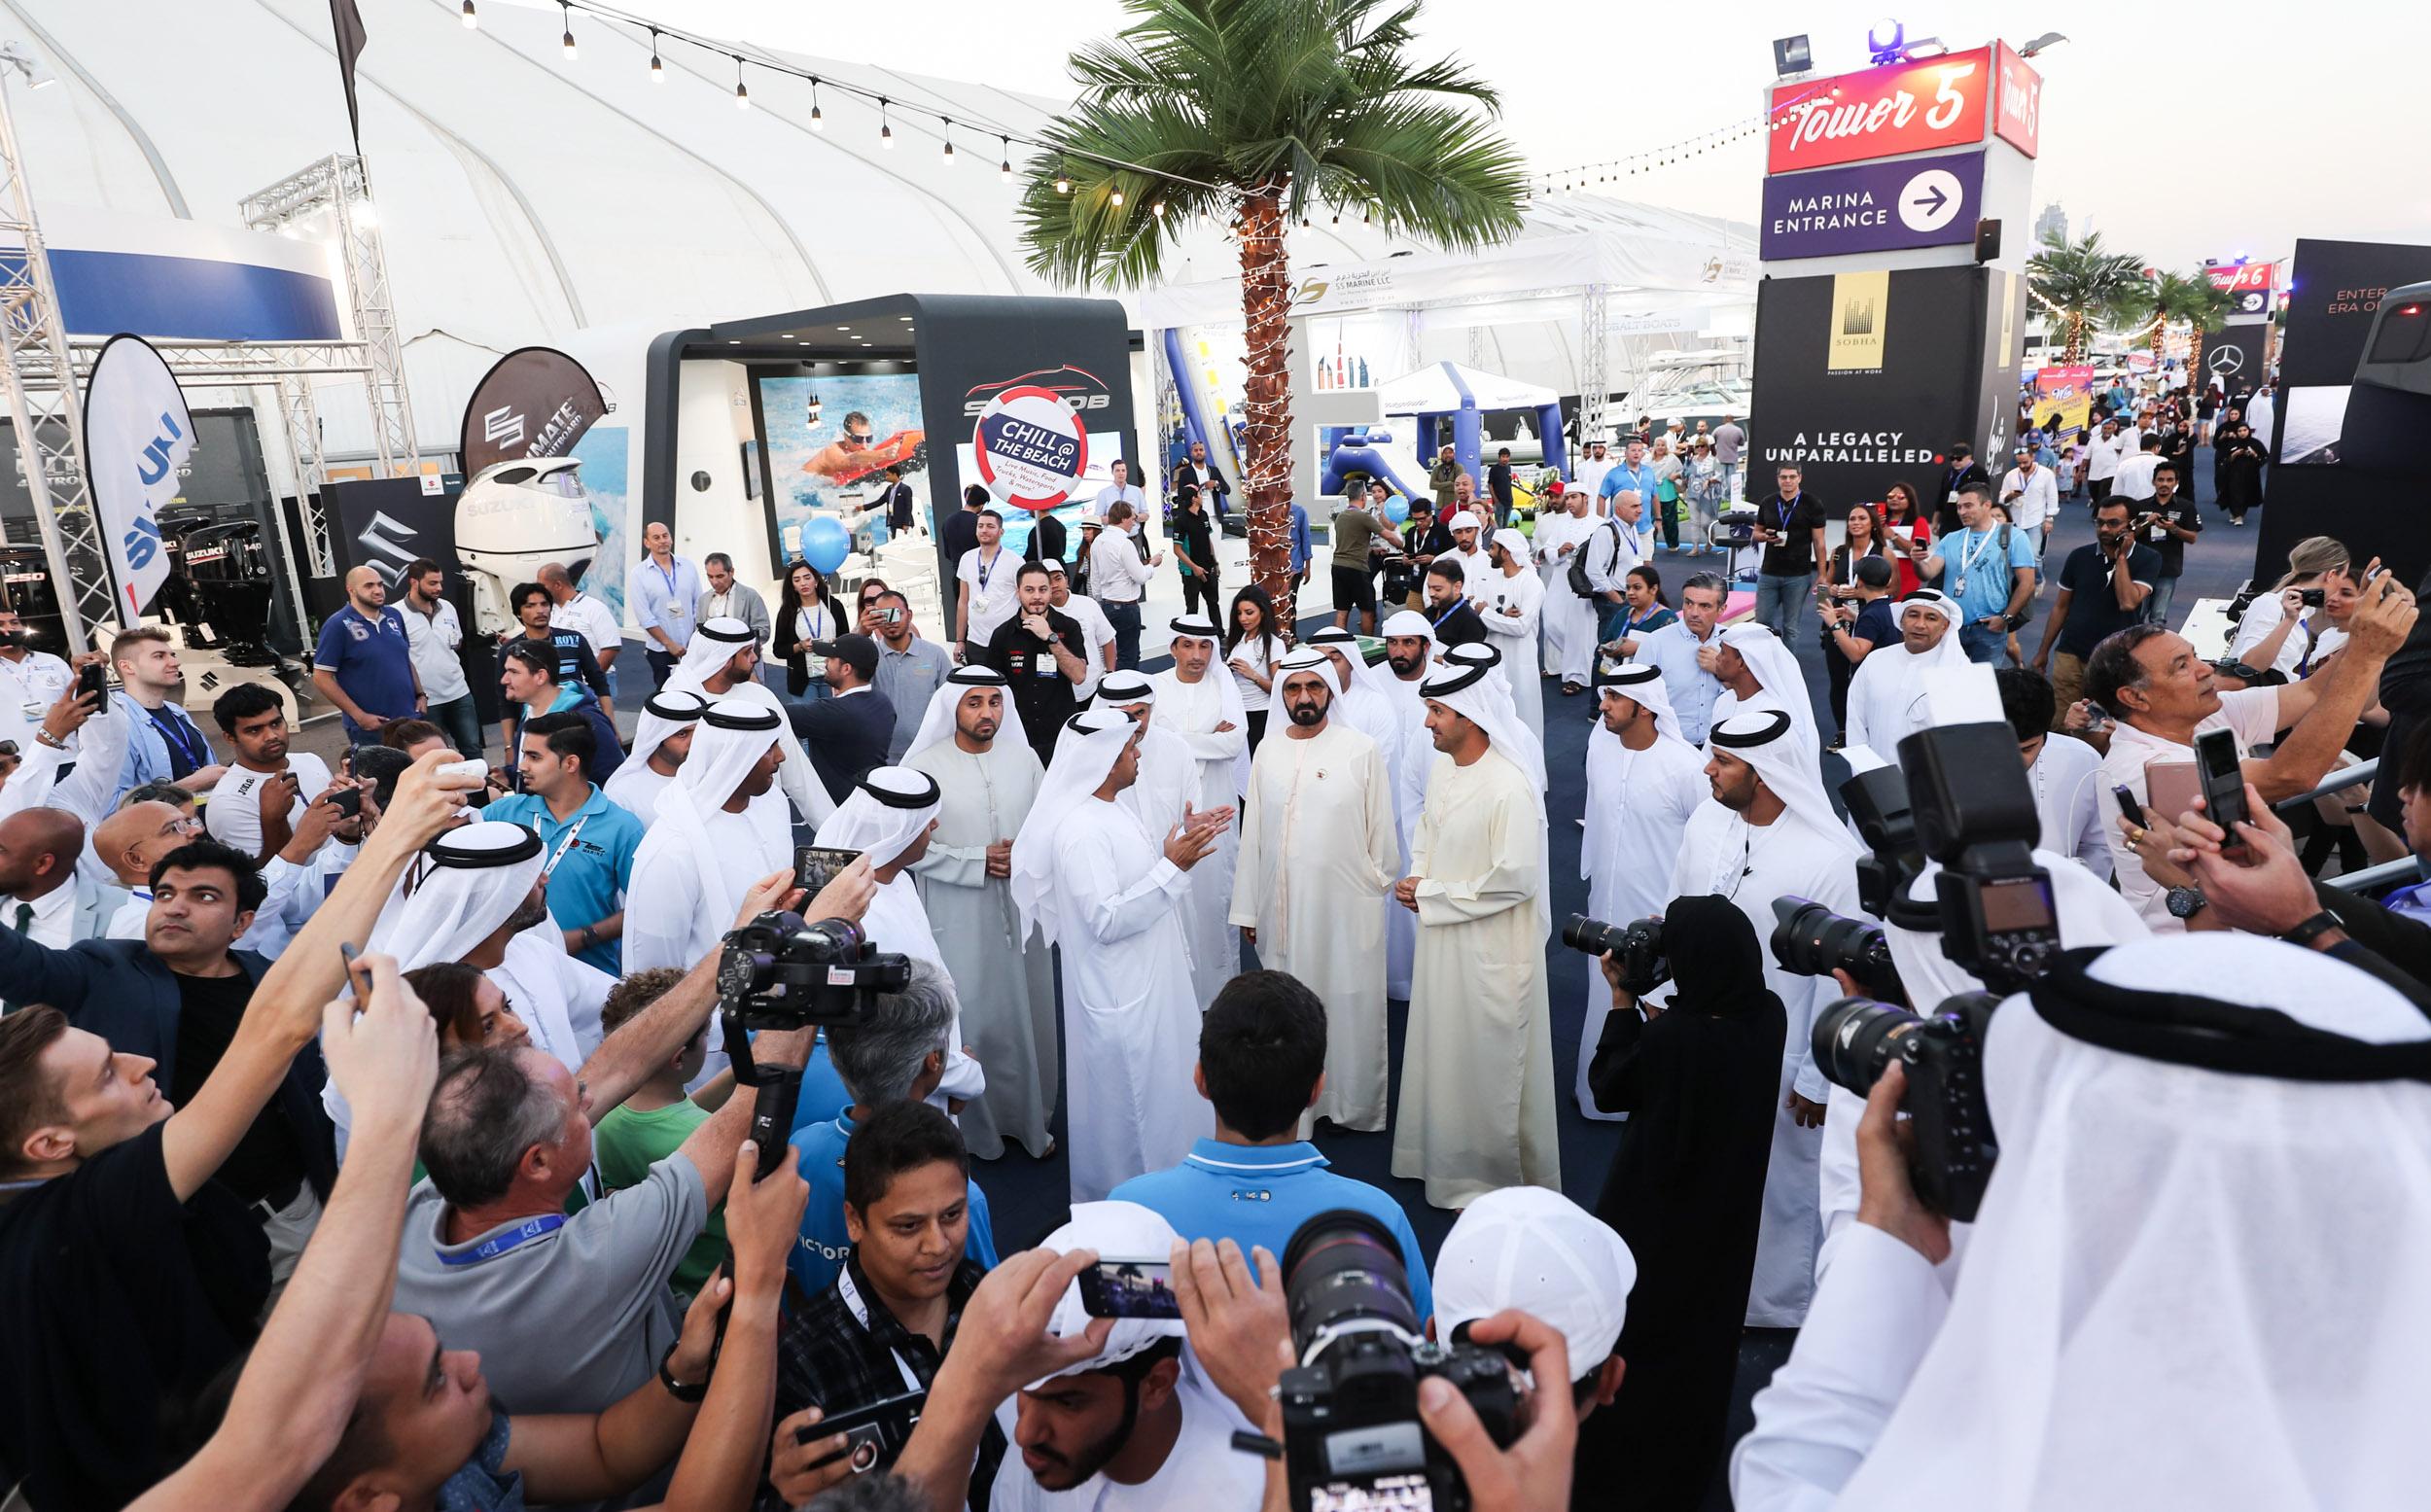 His Highness Sheikh Mohammed bin Rashid Al Maktoum at the DIBS 2018